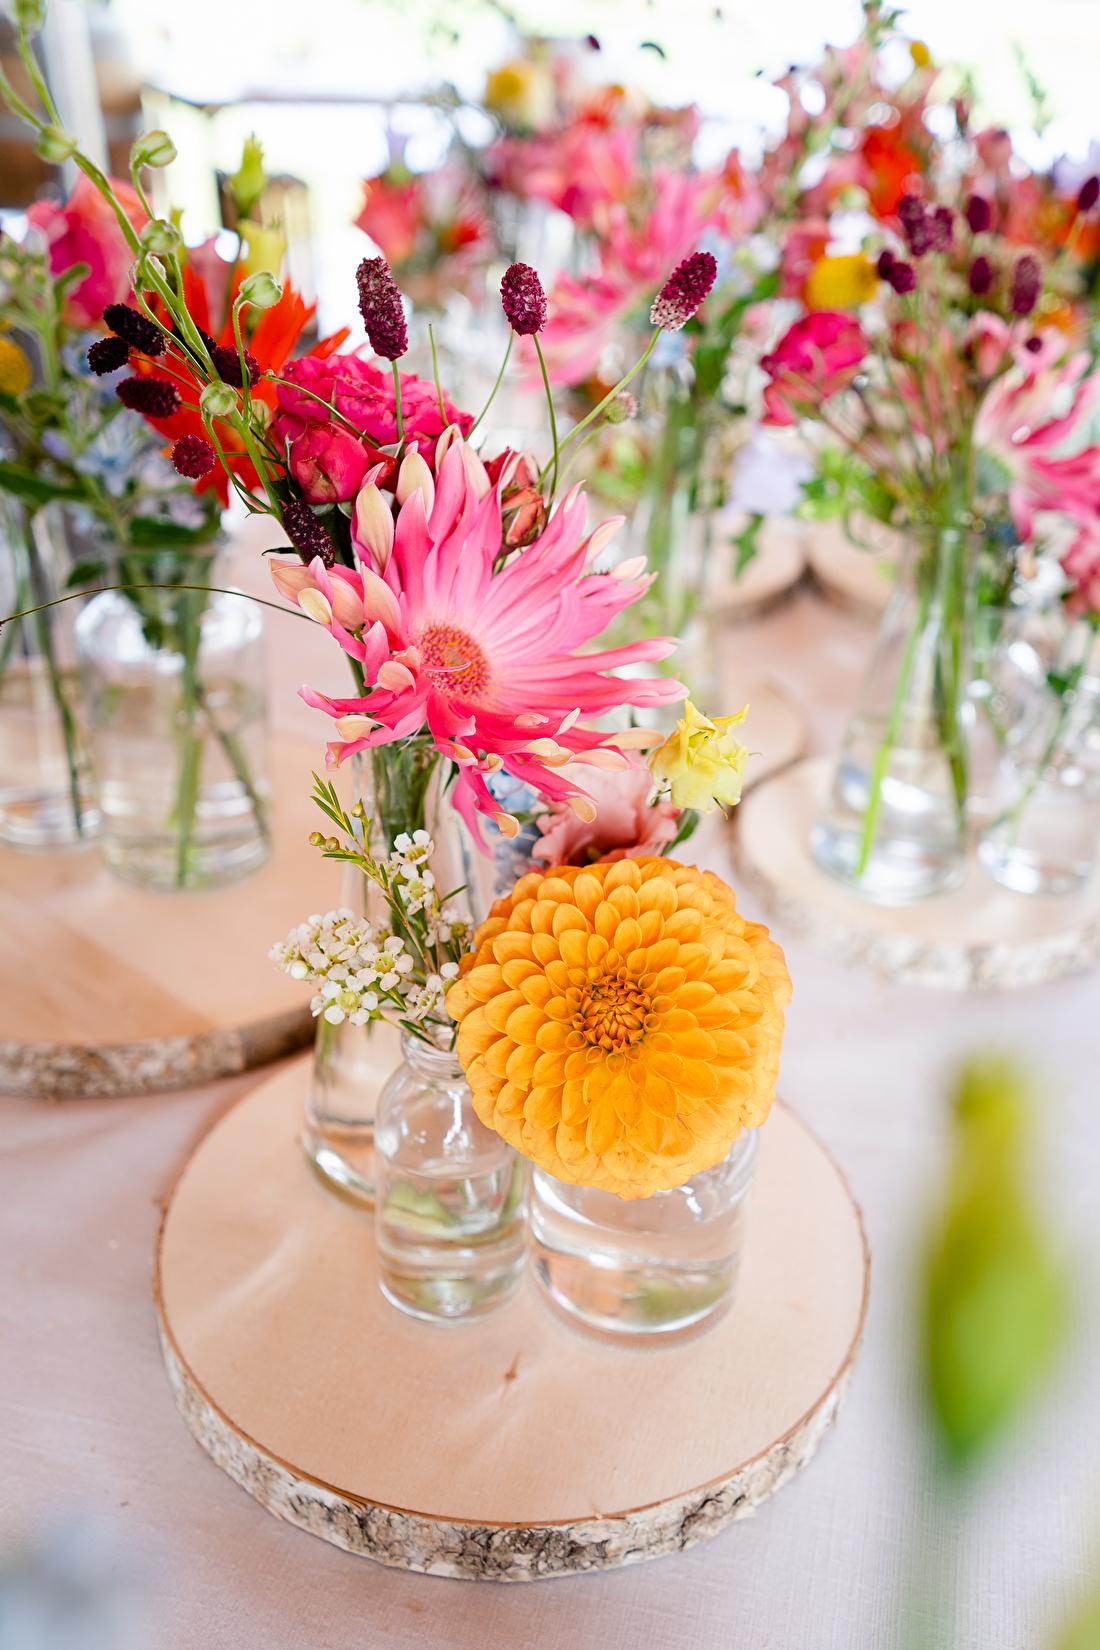 Barneveld-Bloomed-Bruidsbloemen-Zomer-Kleurrijk